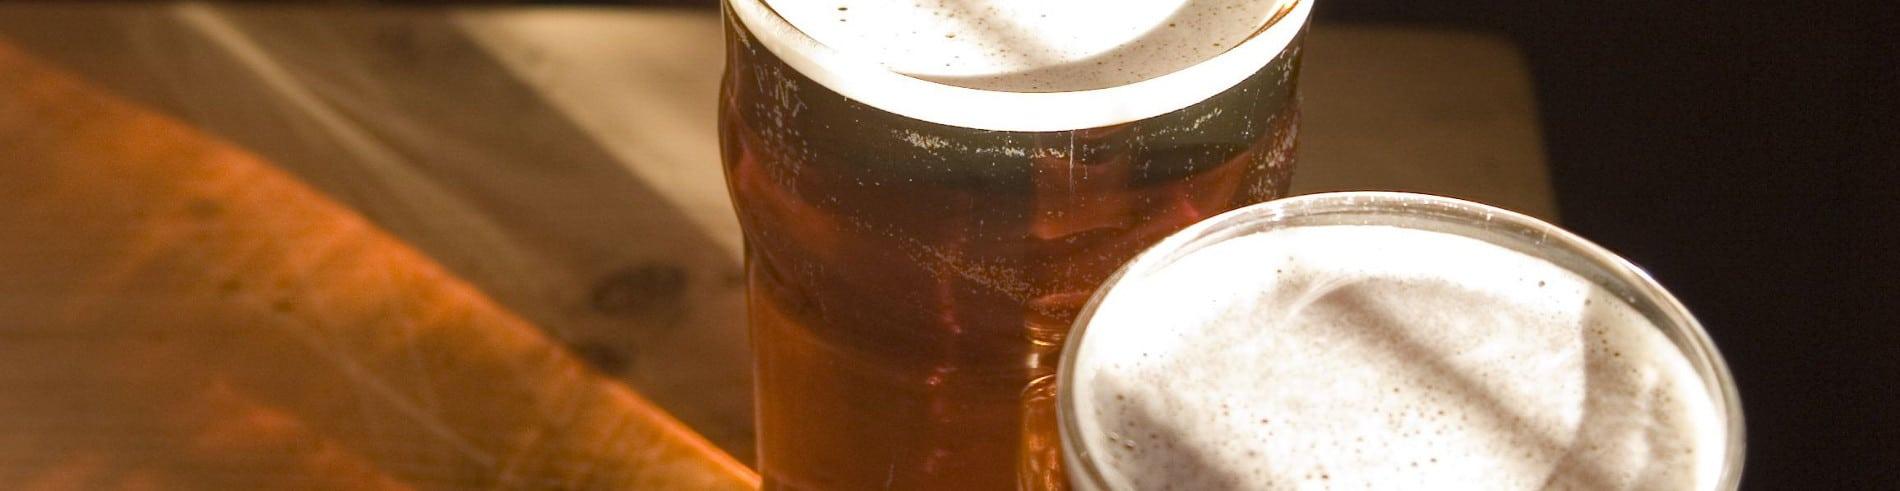 Beer Sales fall in Q3